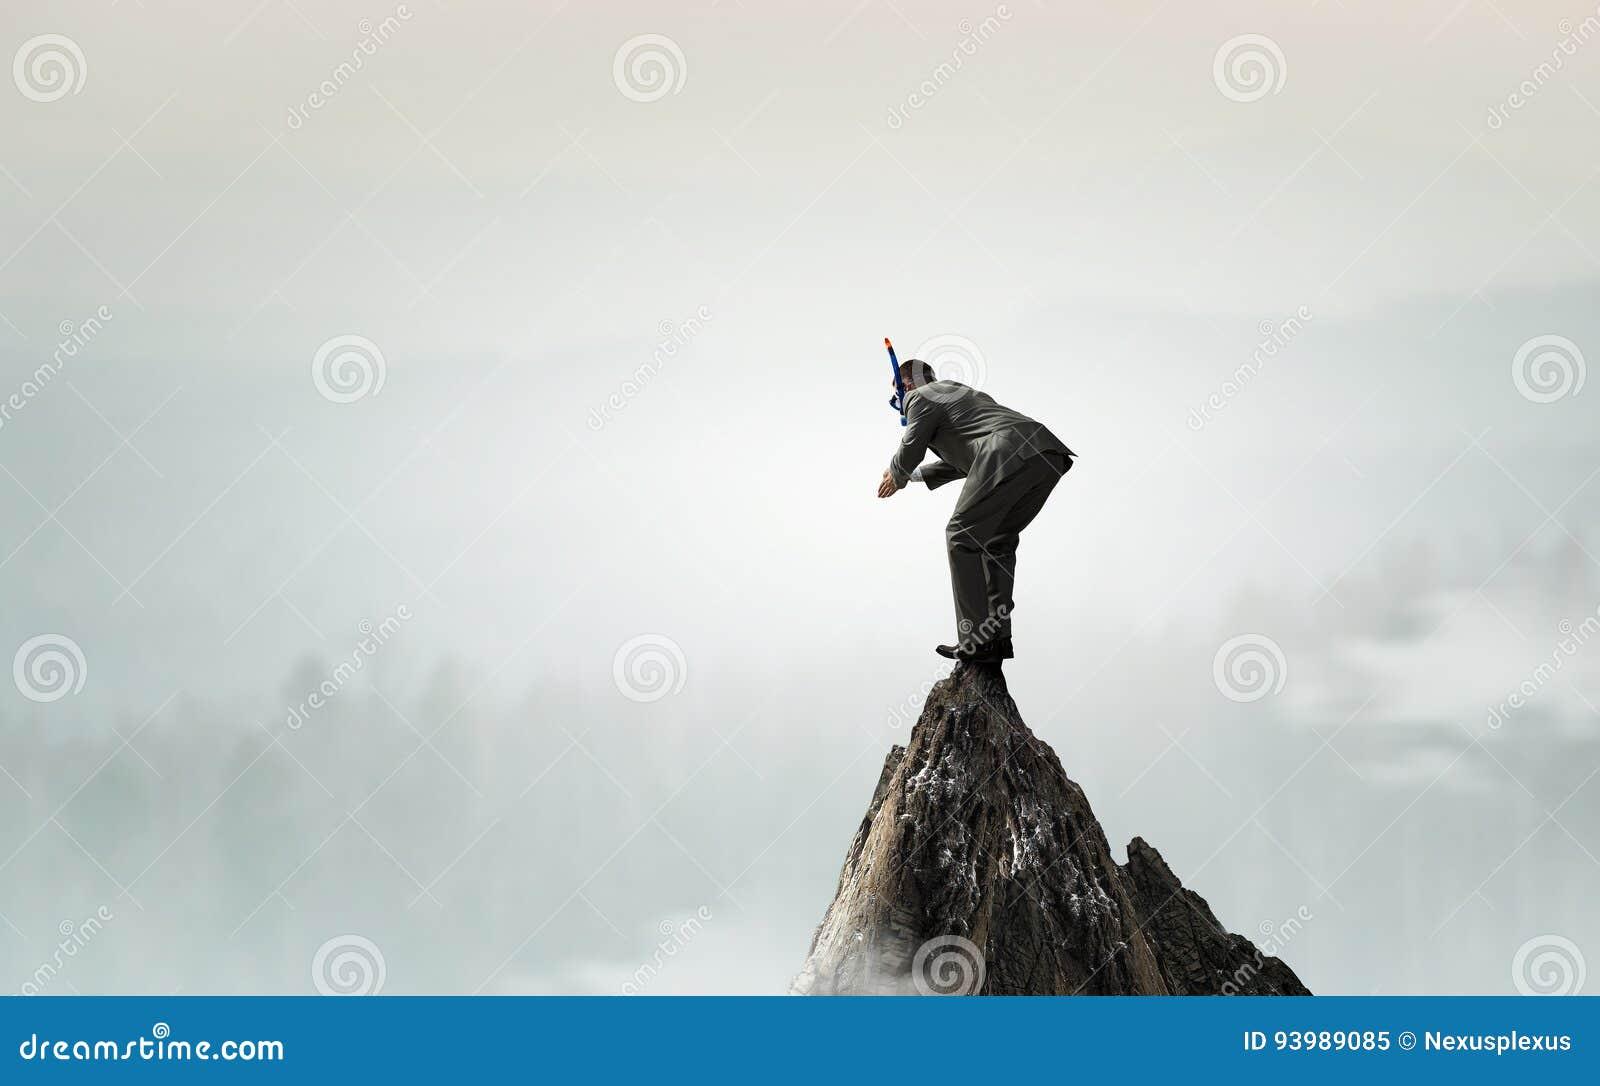 Salto del hombre de negocios del top